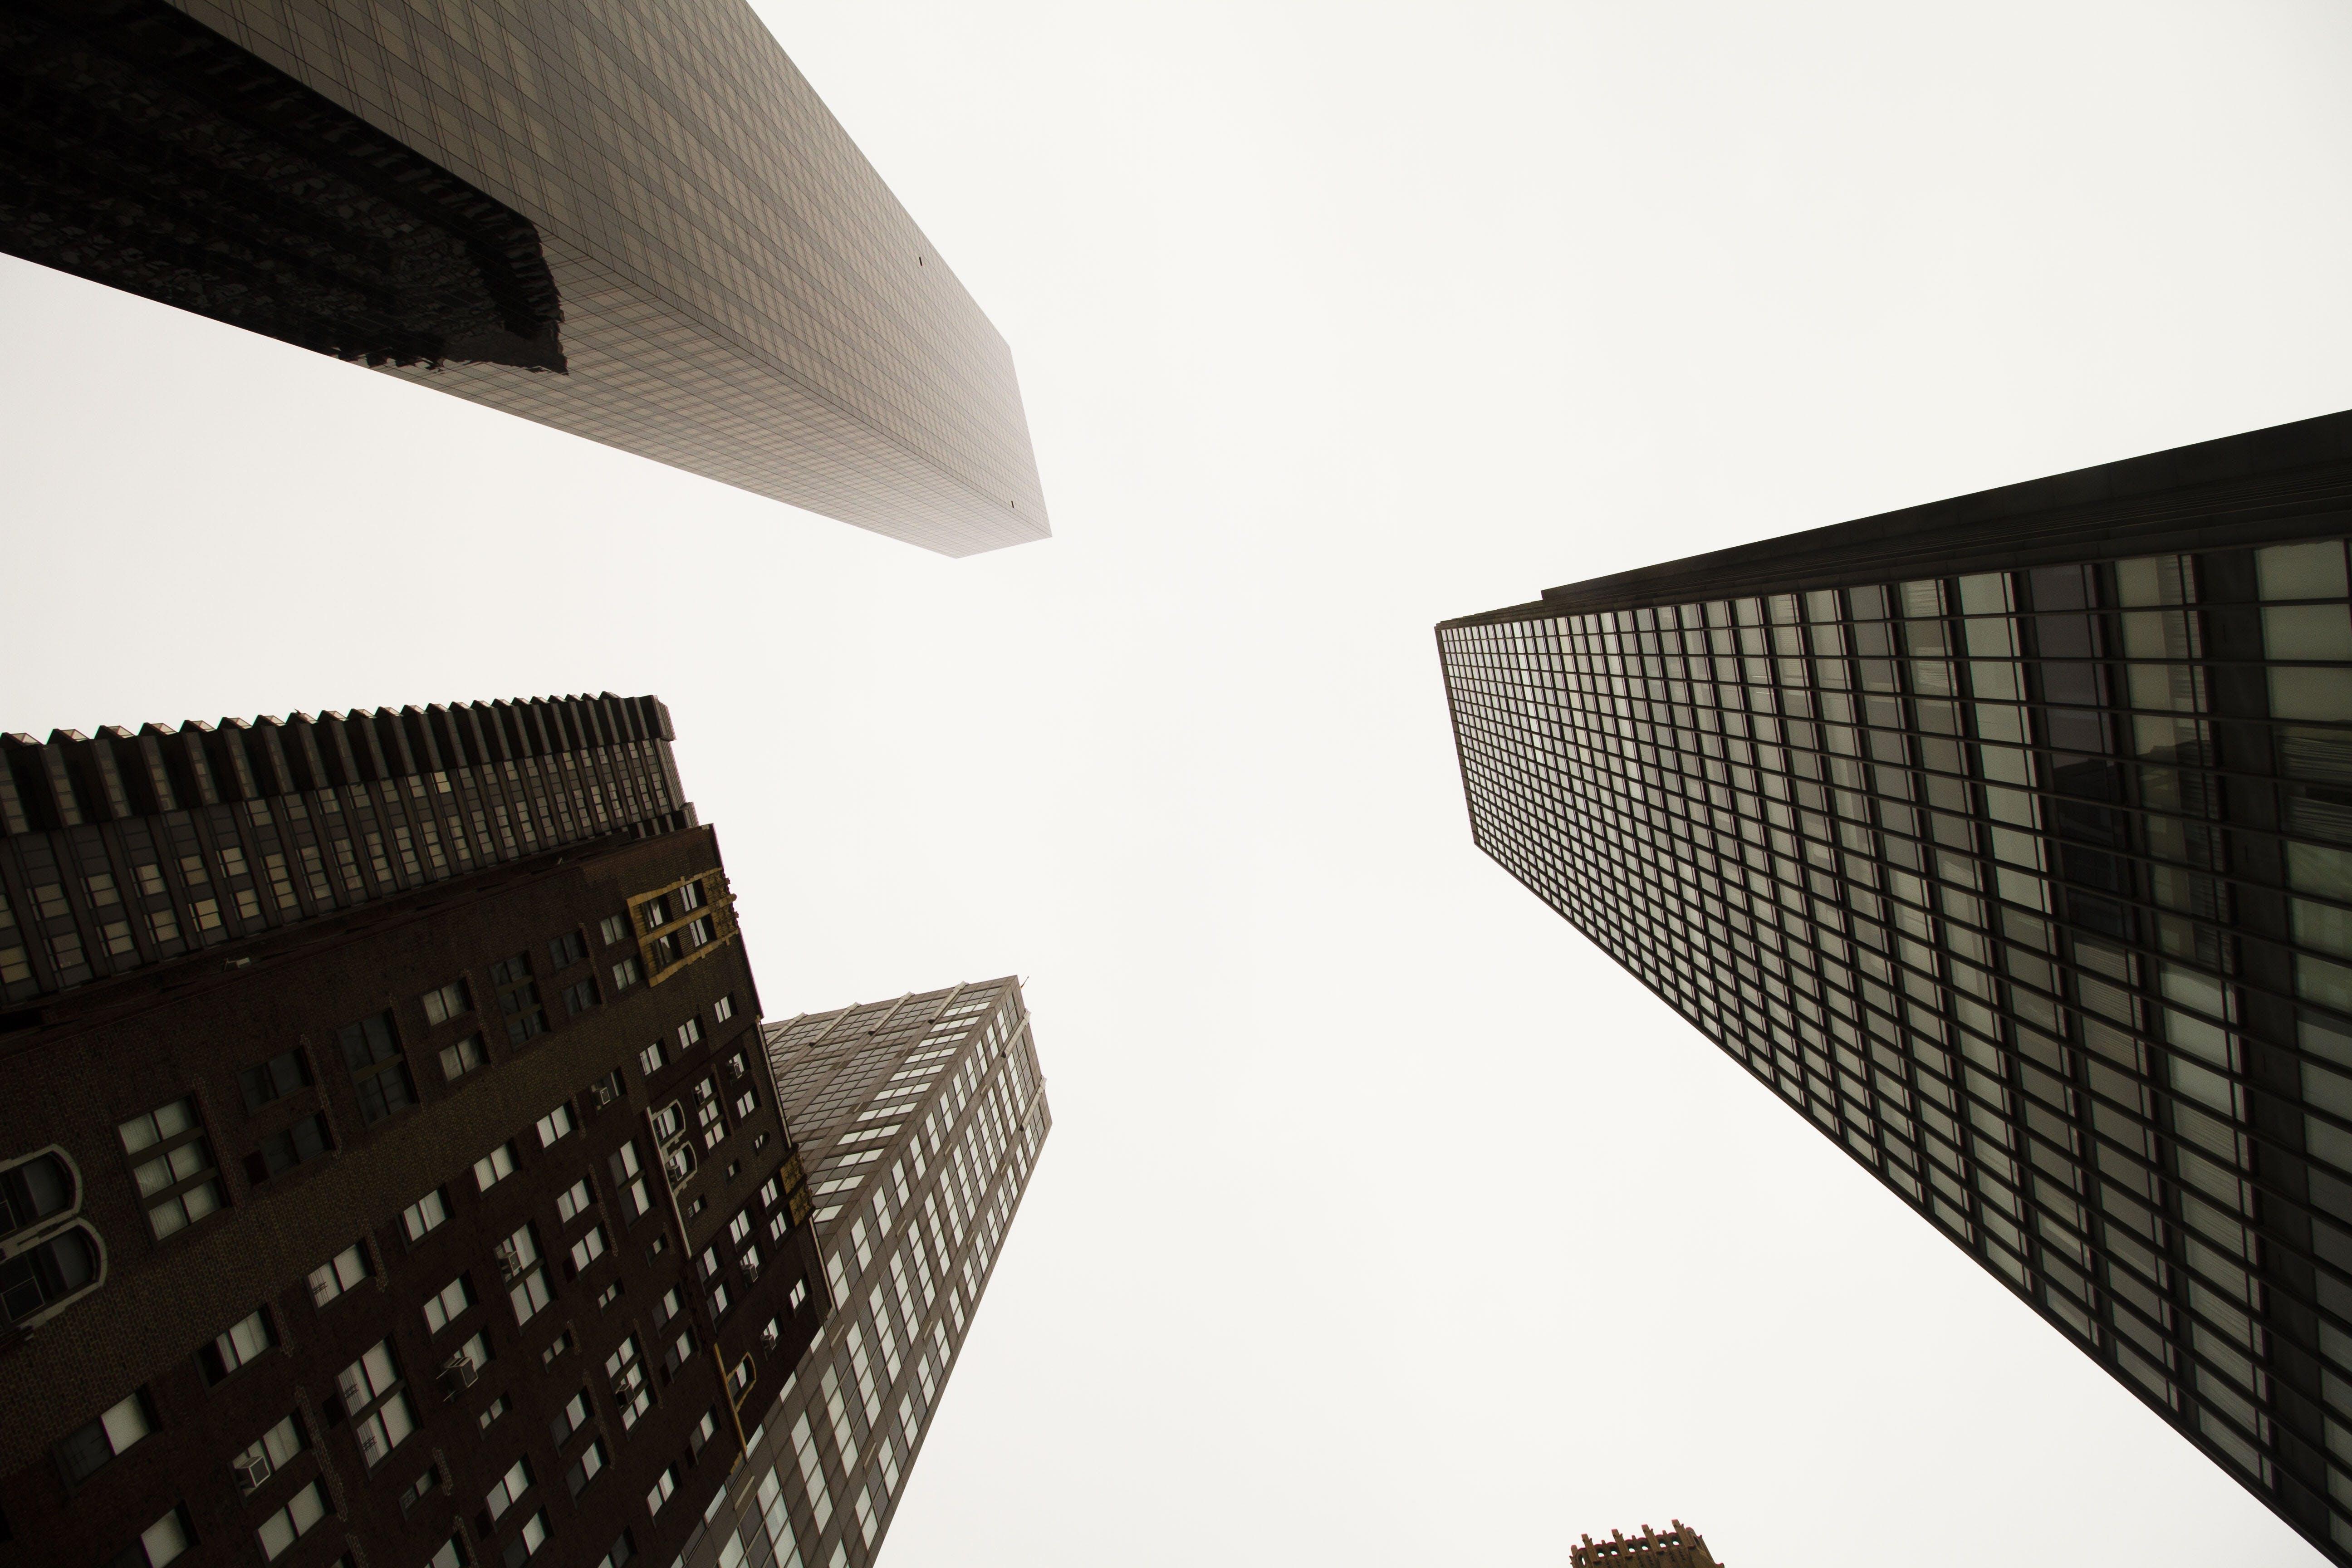 architecture, buildings, business